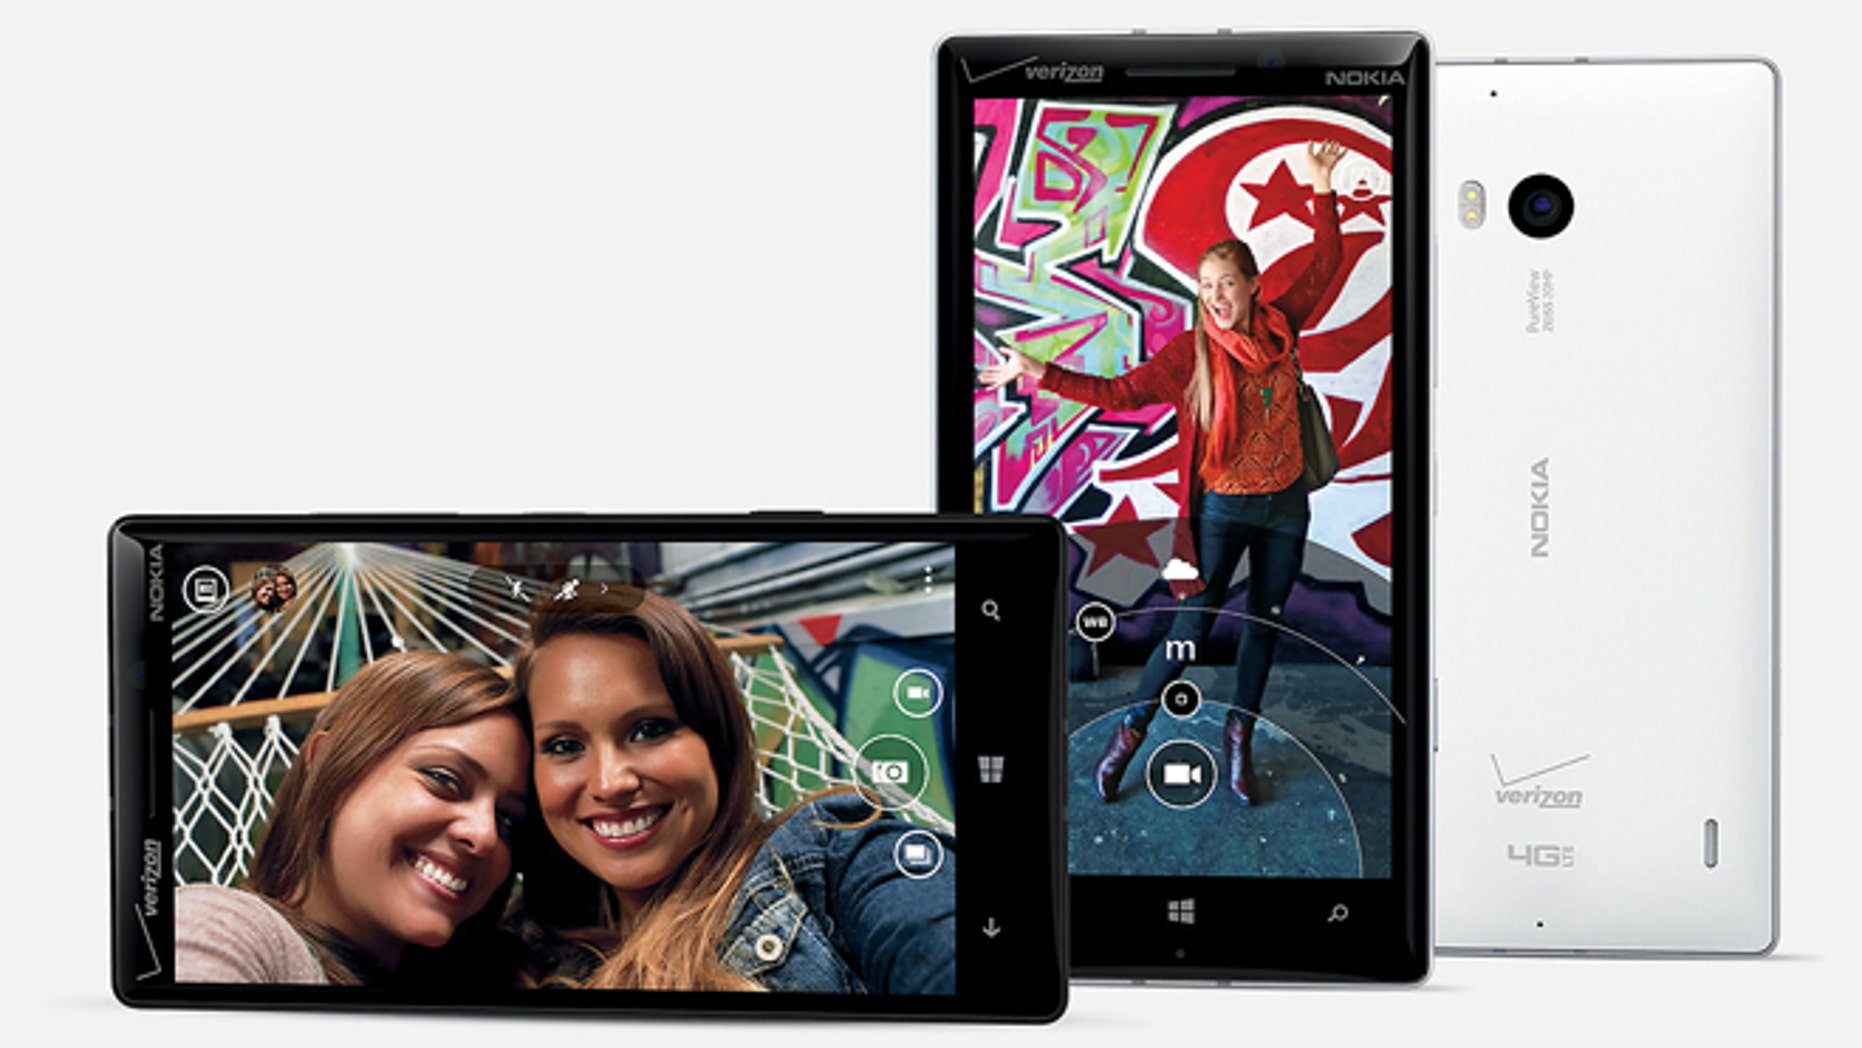 The new Nokia Lumia Icon smartphone.